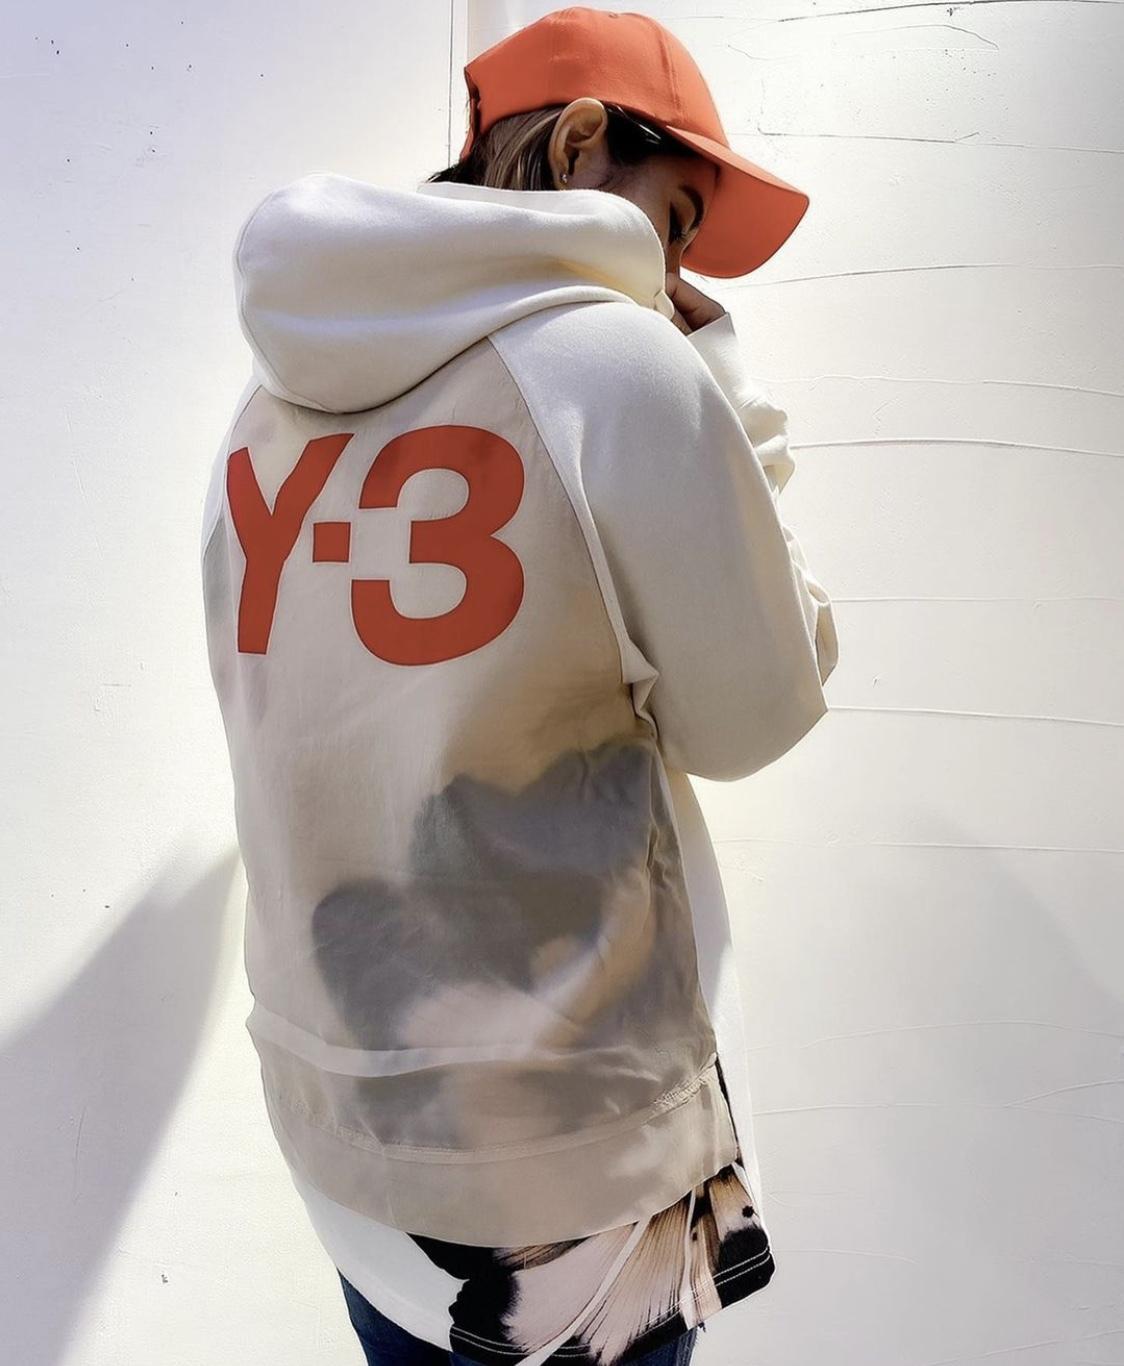 「Y-3 ワイスリー」新作パーカー【M SD RWTRY GFXHOOD_LG】入荷です。_c0204280_13031610.jpg